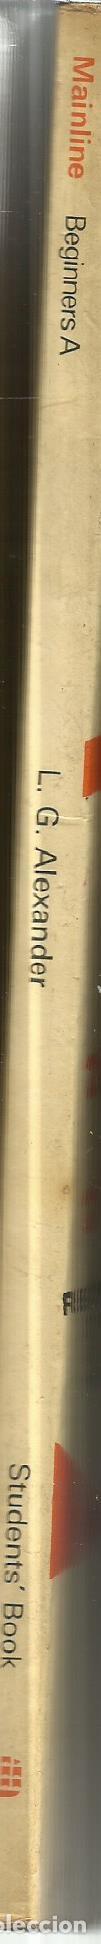 Libros antiguos: MAINLINE. BEGINNERS A. L.G. ALEXANDER. OXFORD. LONDON. 1978 - Foto 2 - 83375296